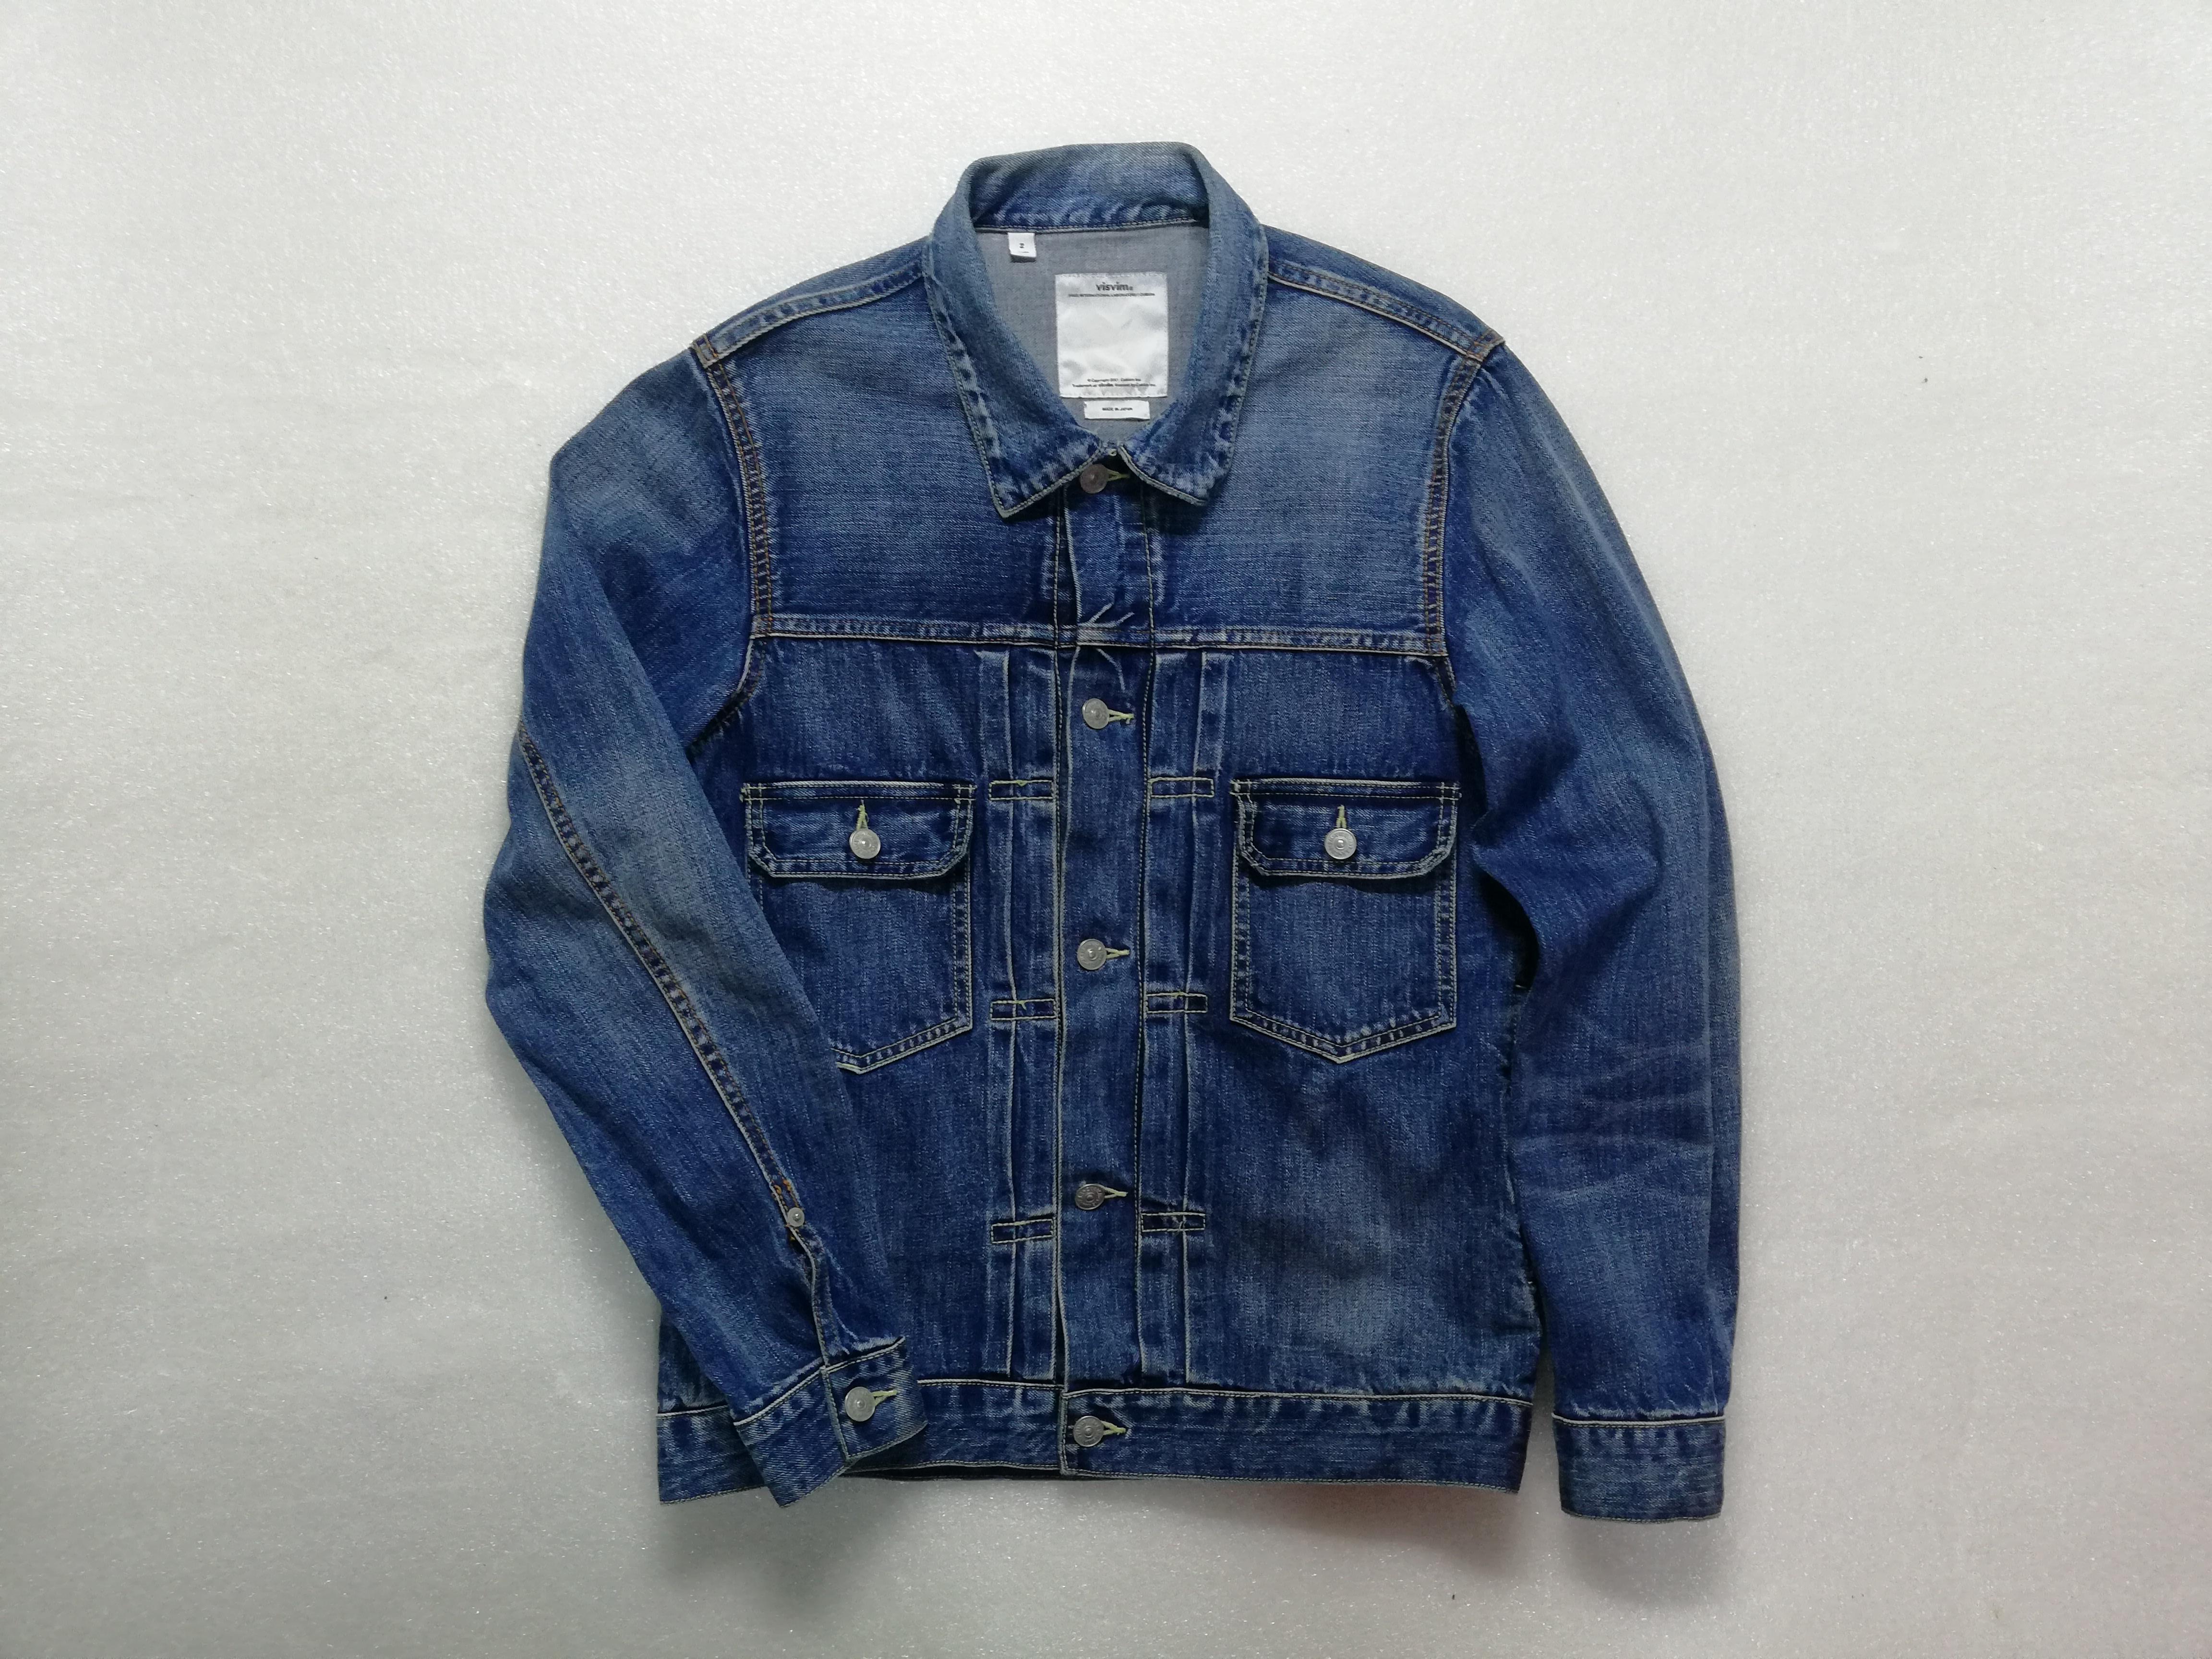 fef1bb806291 Visvim SS 101 Denim Jacket Damaged  Final Sale  Size m - Denim ...